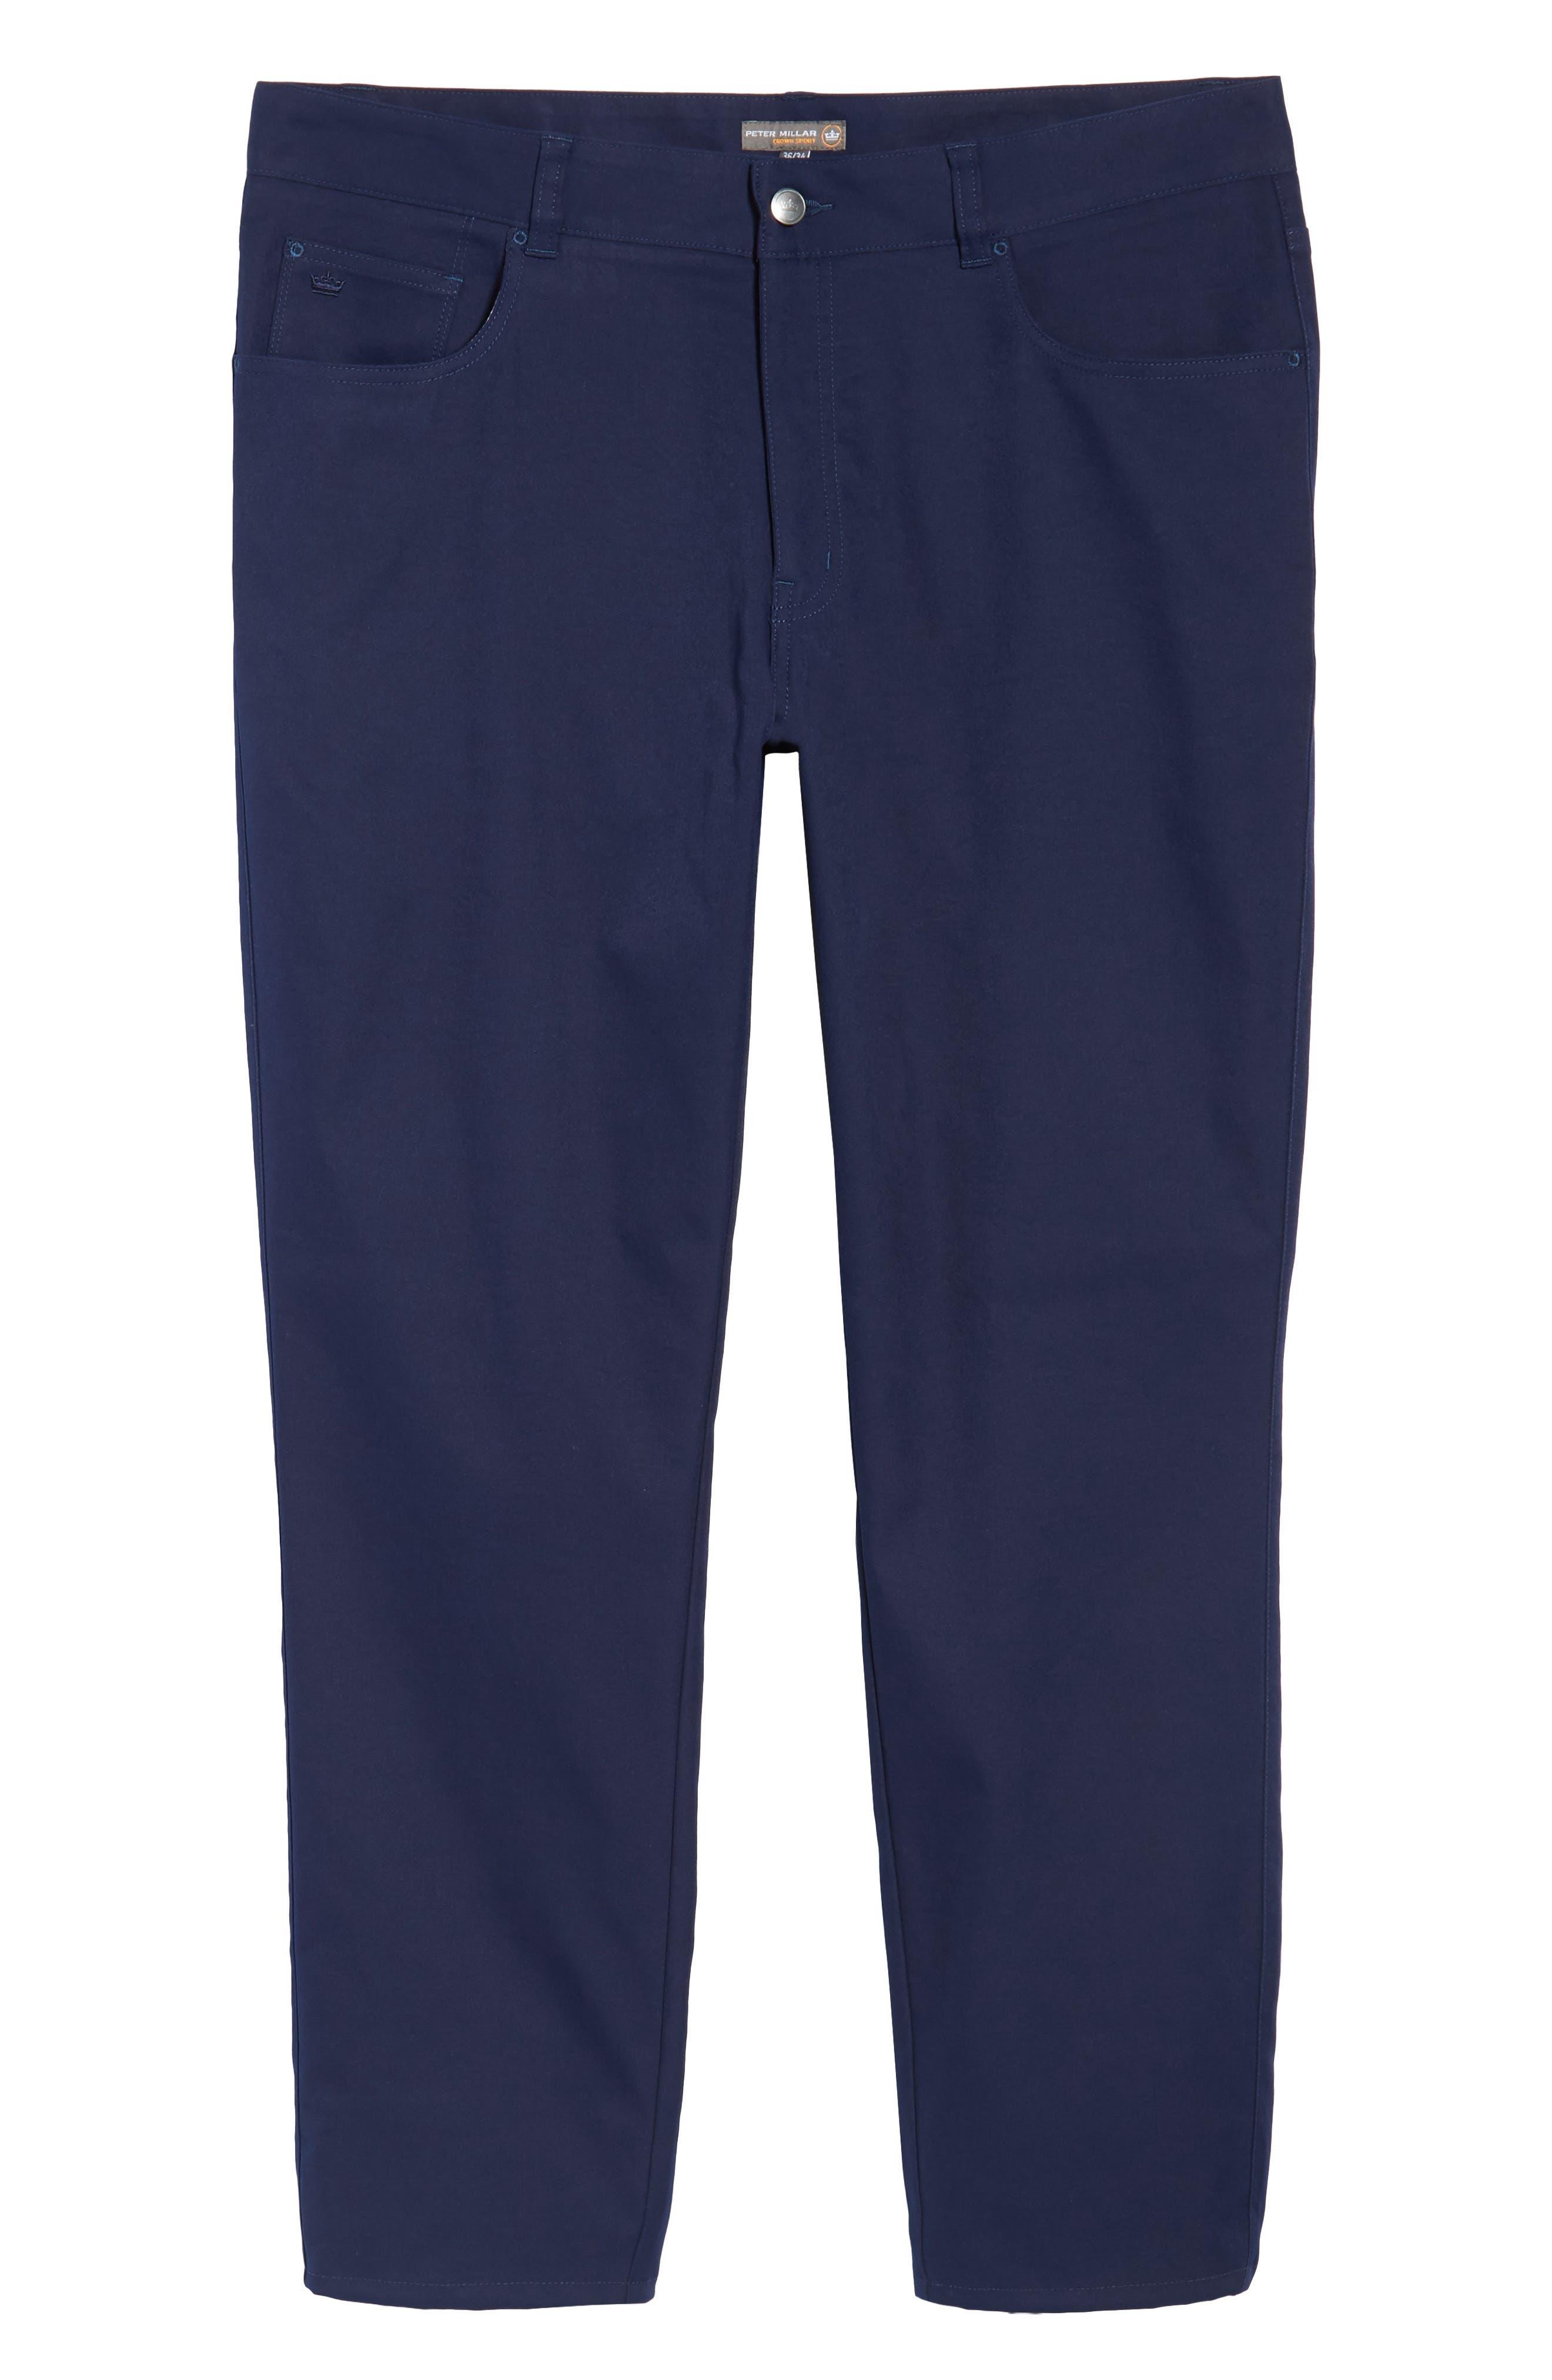 EB66 Performance Six-Pocket Pants,                             Alternate thumbnail 36, color,